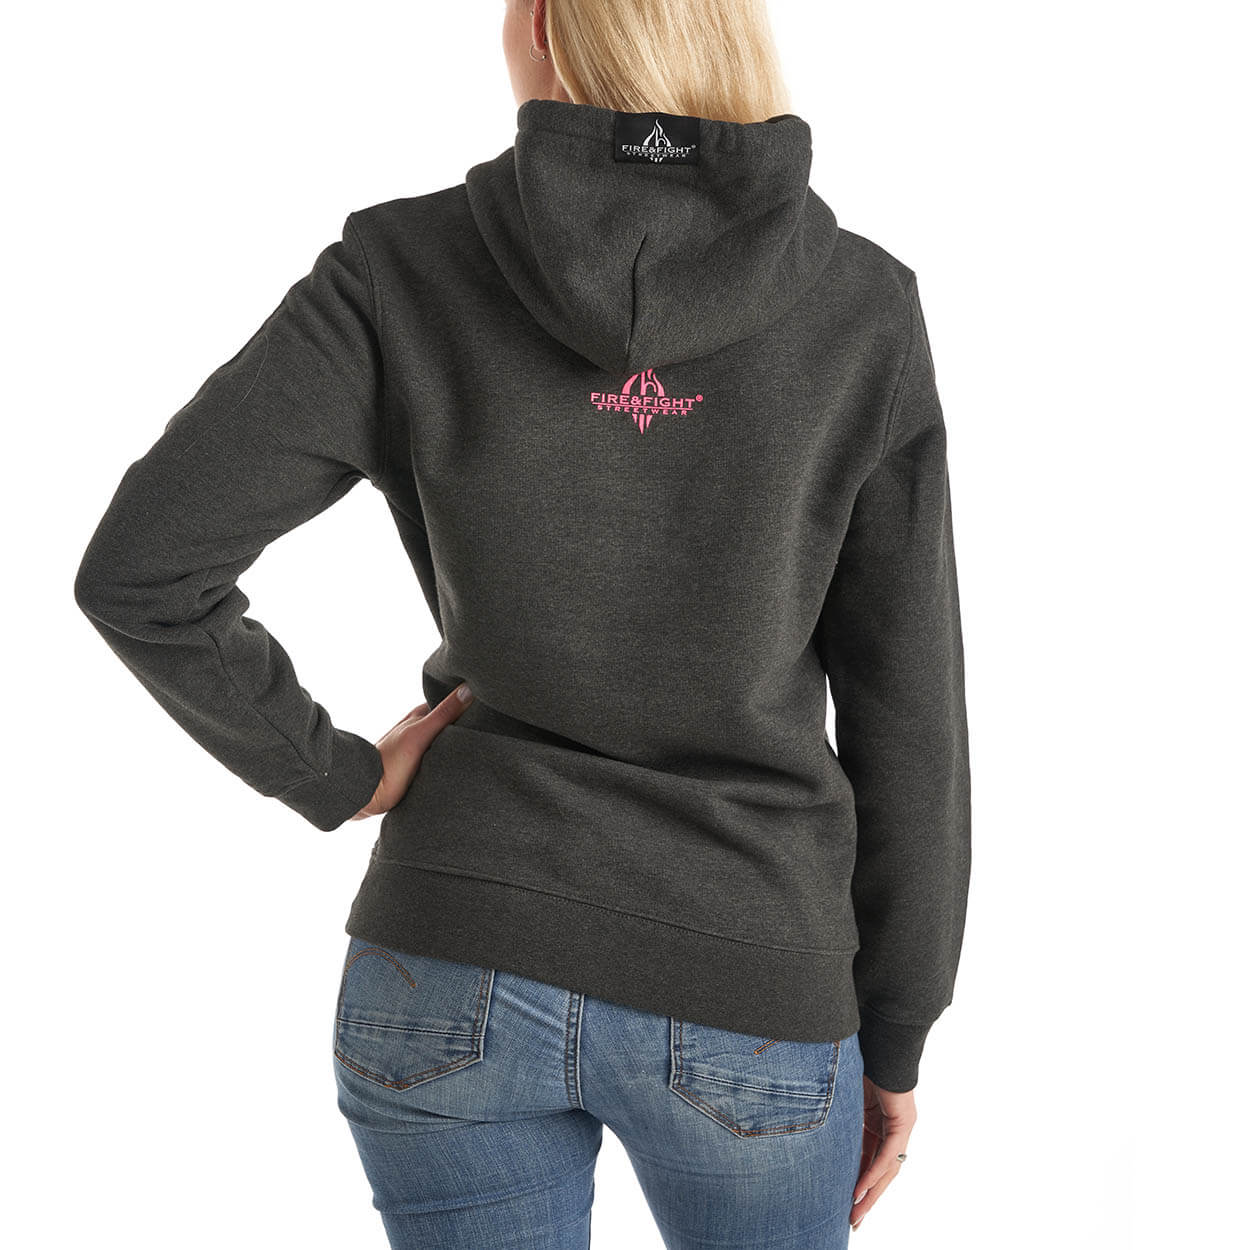 Feuerwehrfamilie Frauen-Kapuzensweater grau meliert